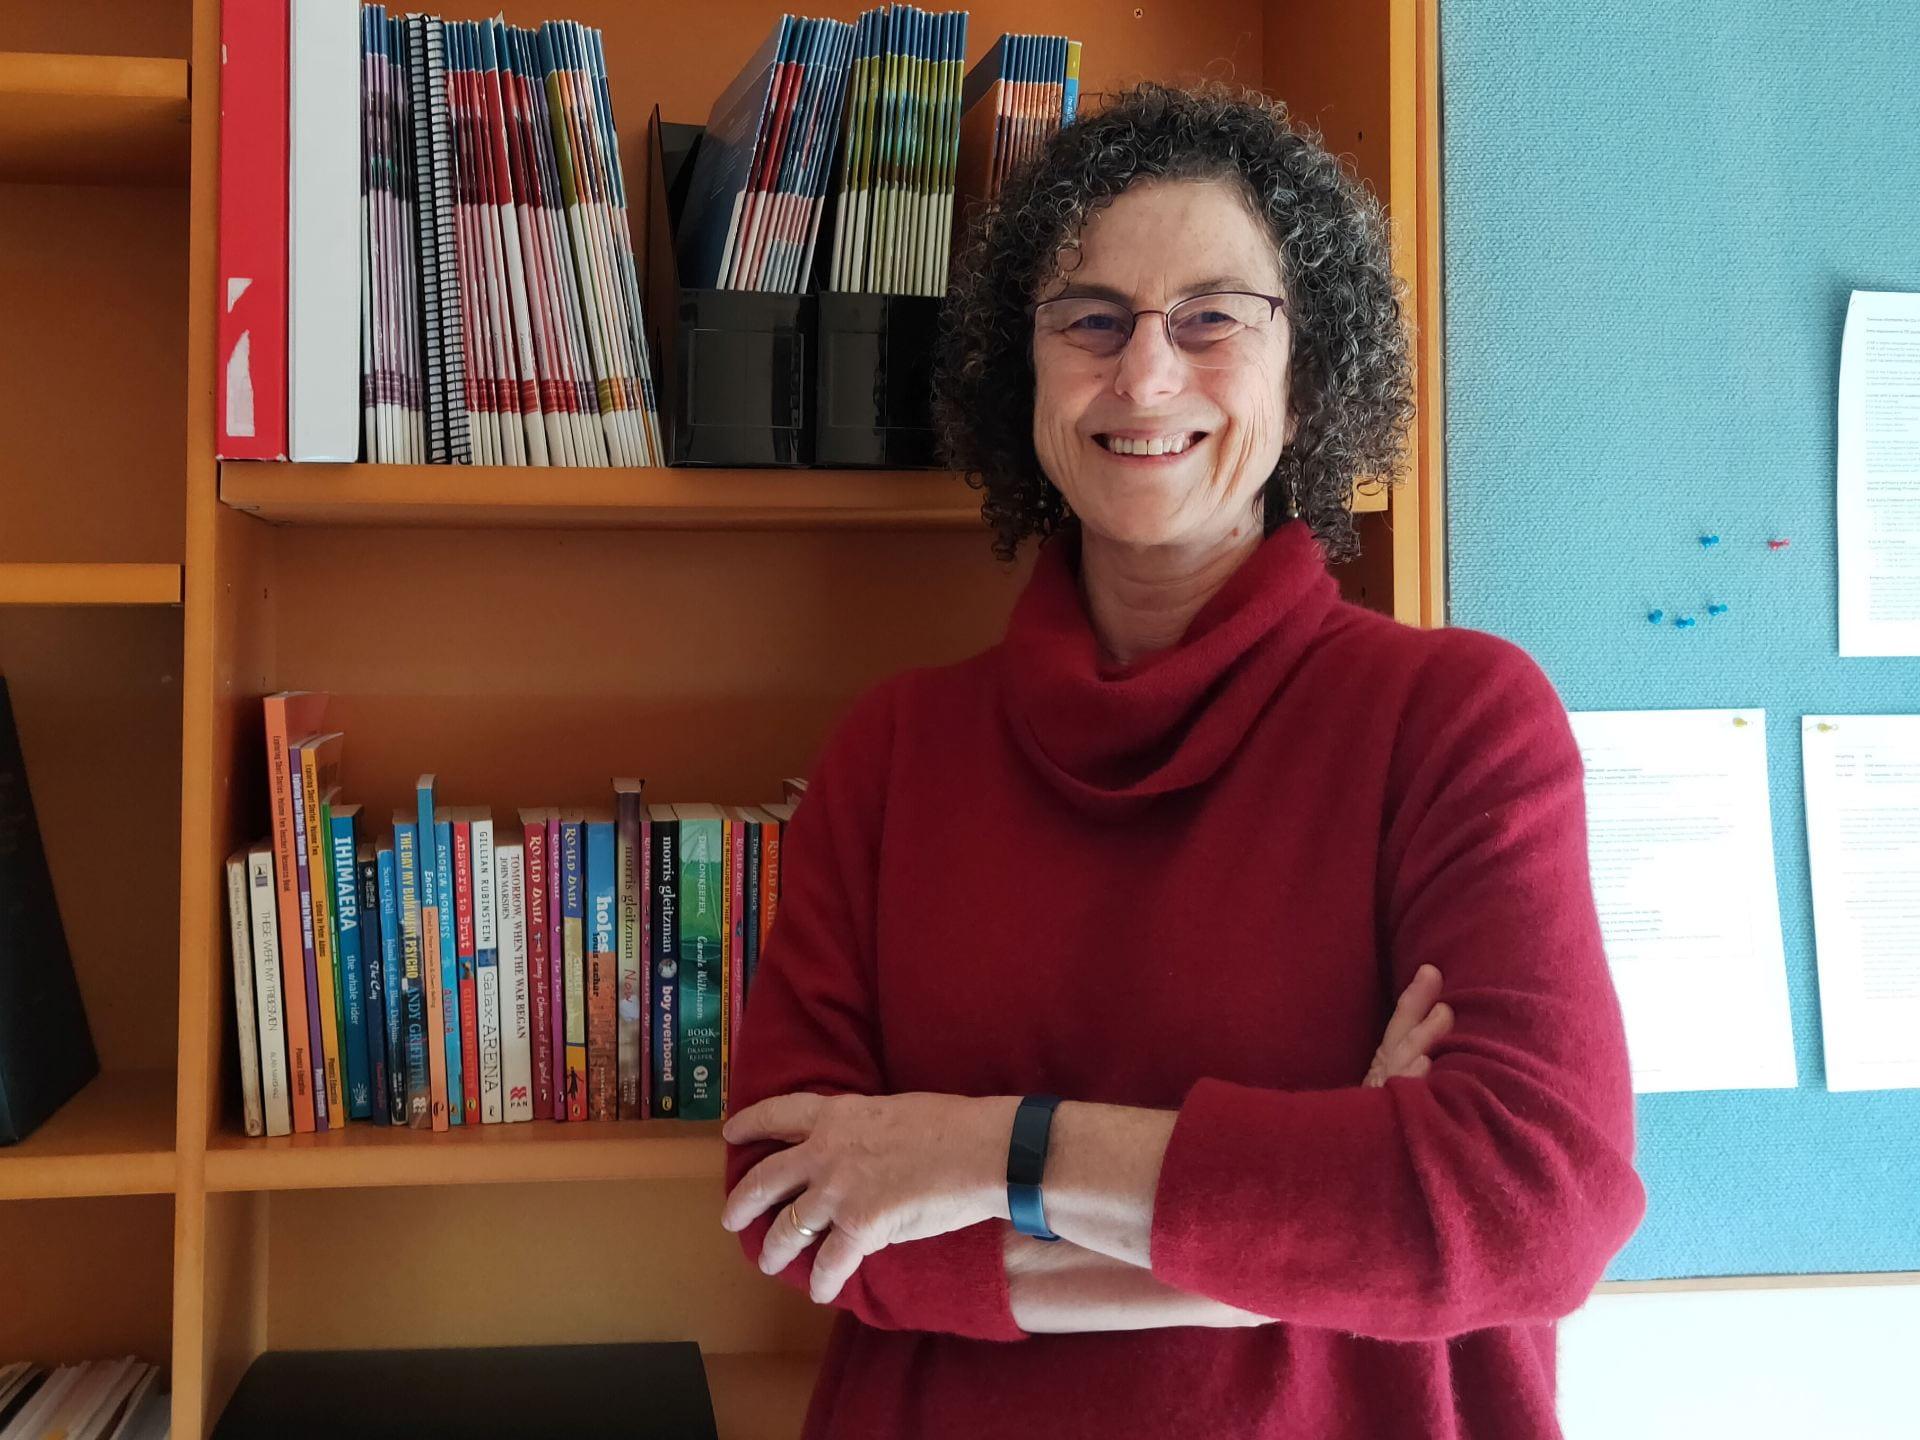 Portrait image of Helen Harper in front of a bookshelf